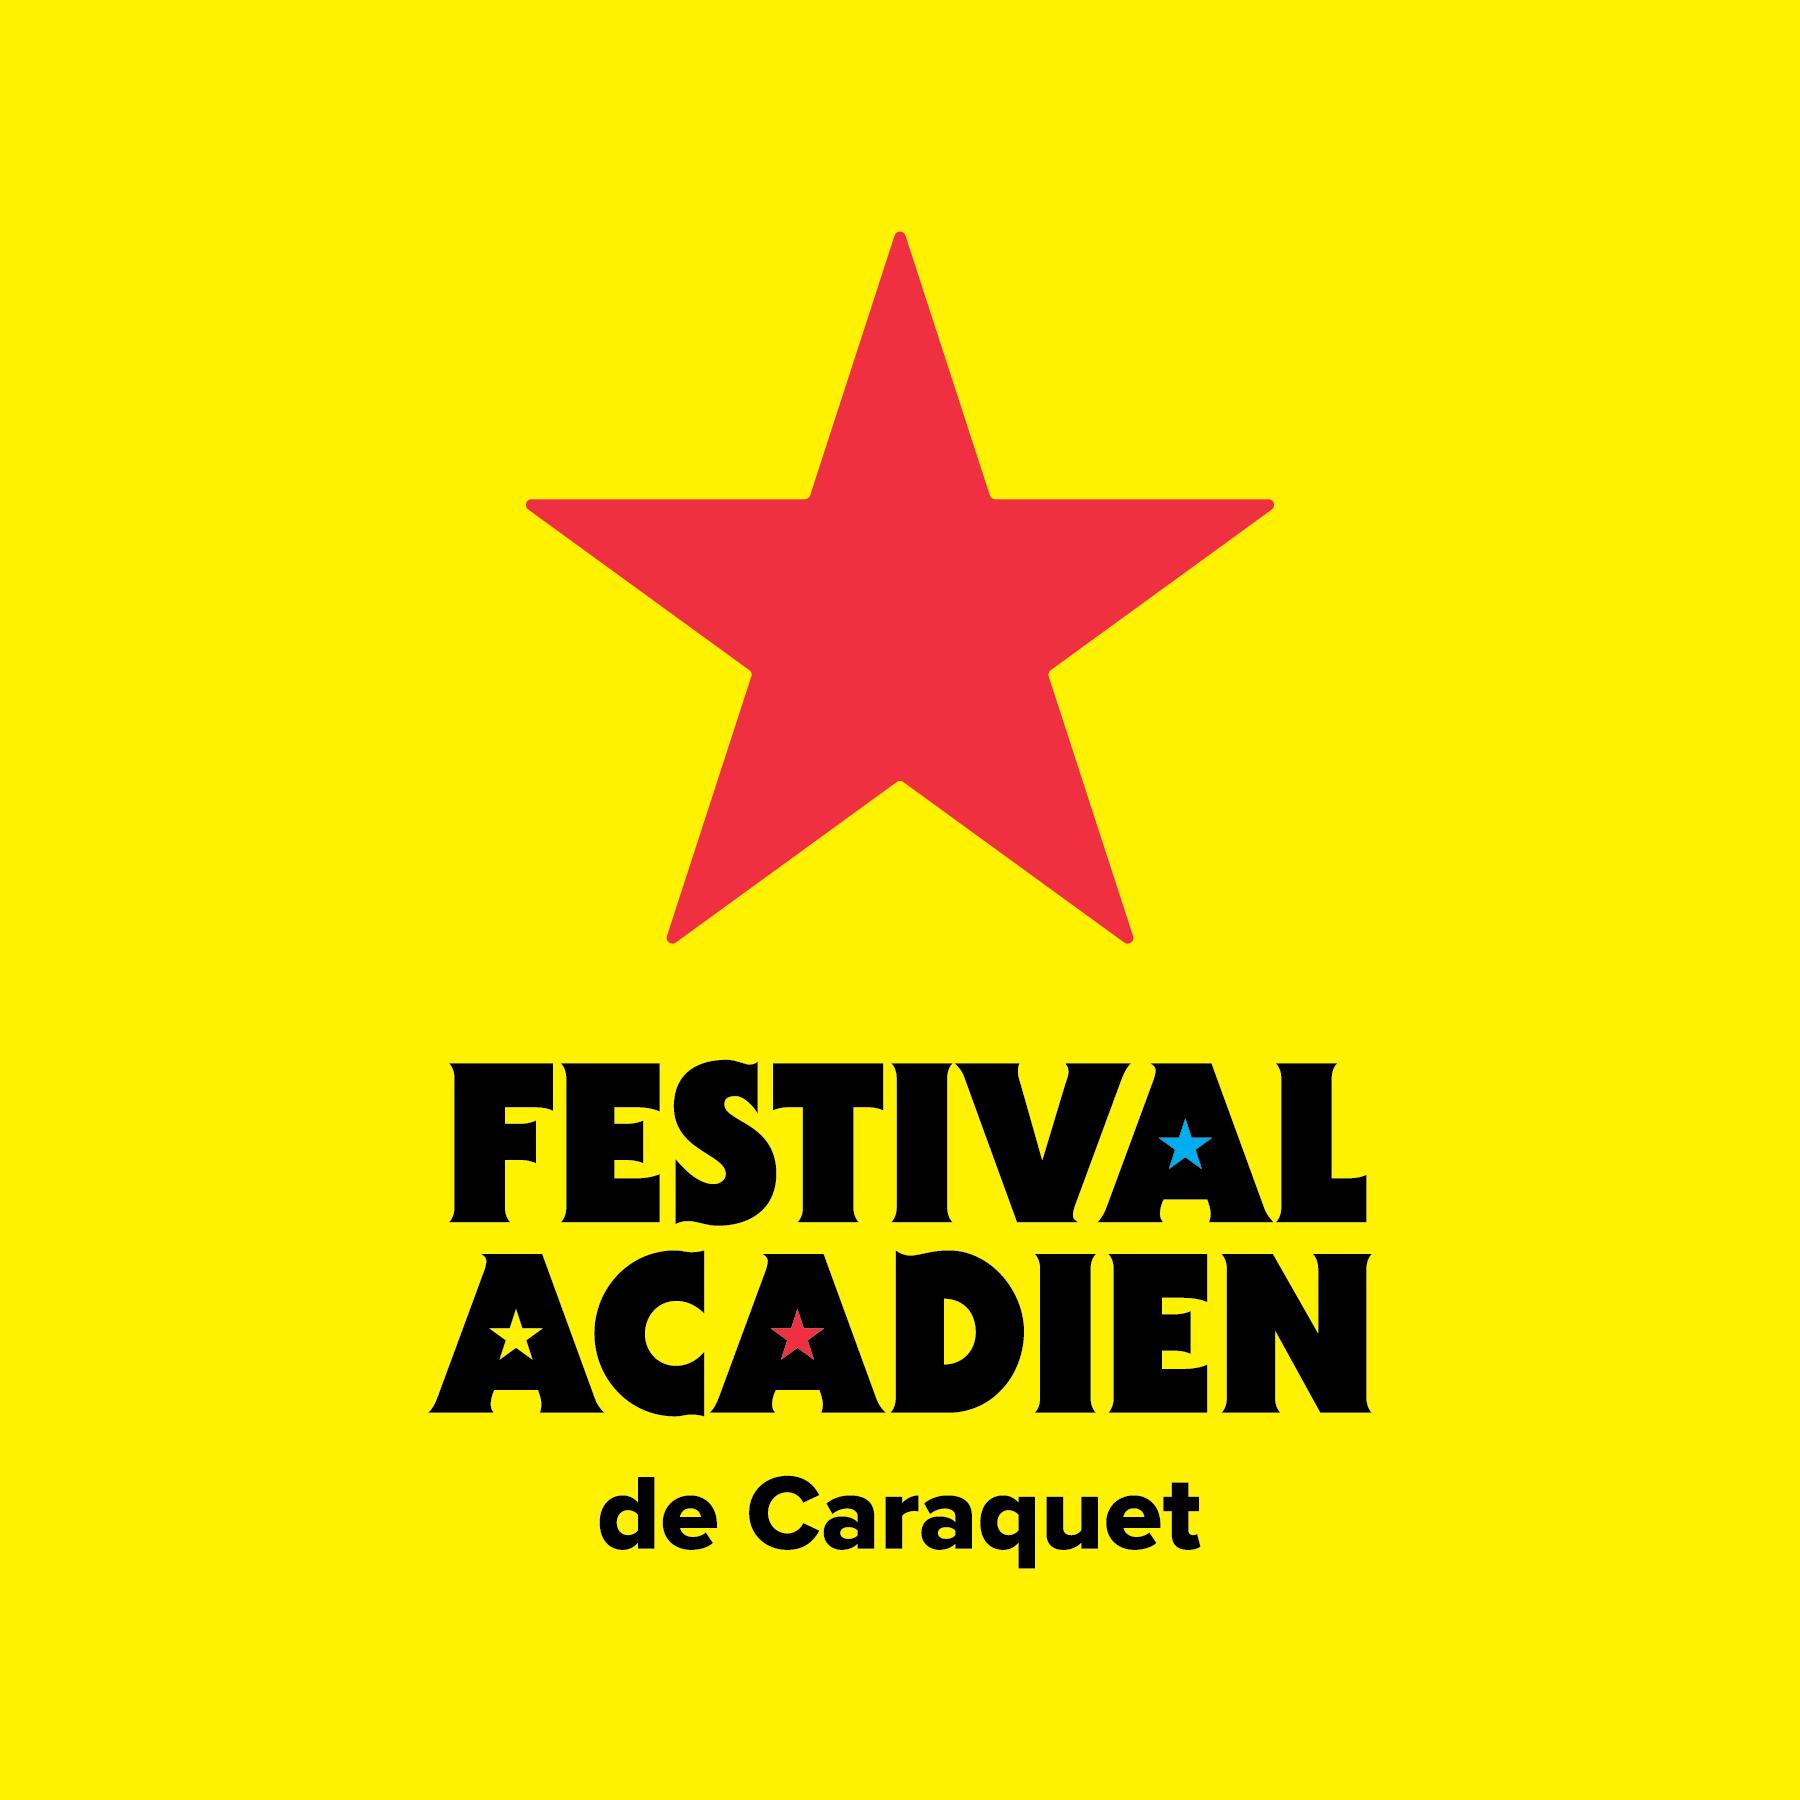 Logo-FestivalAcadien-cou-jaunerouge.png